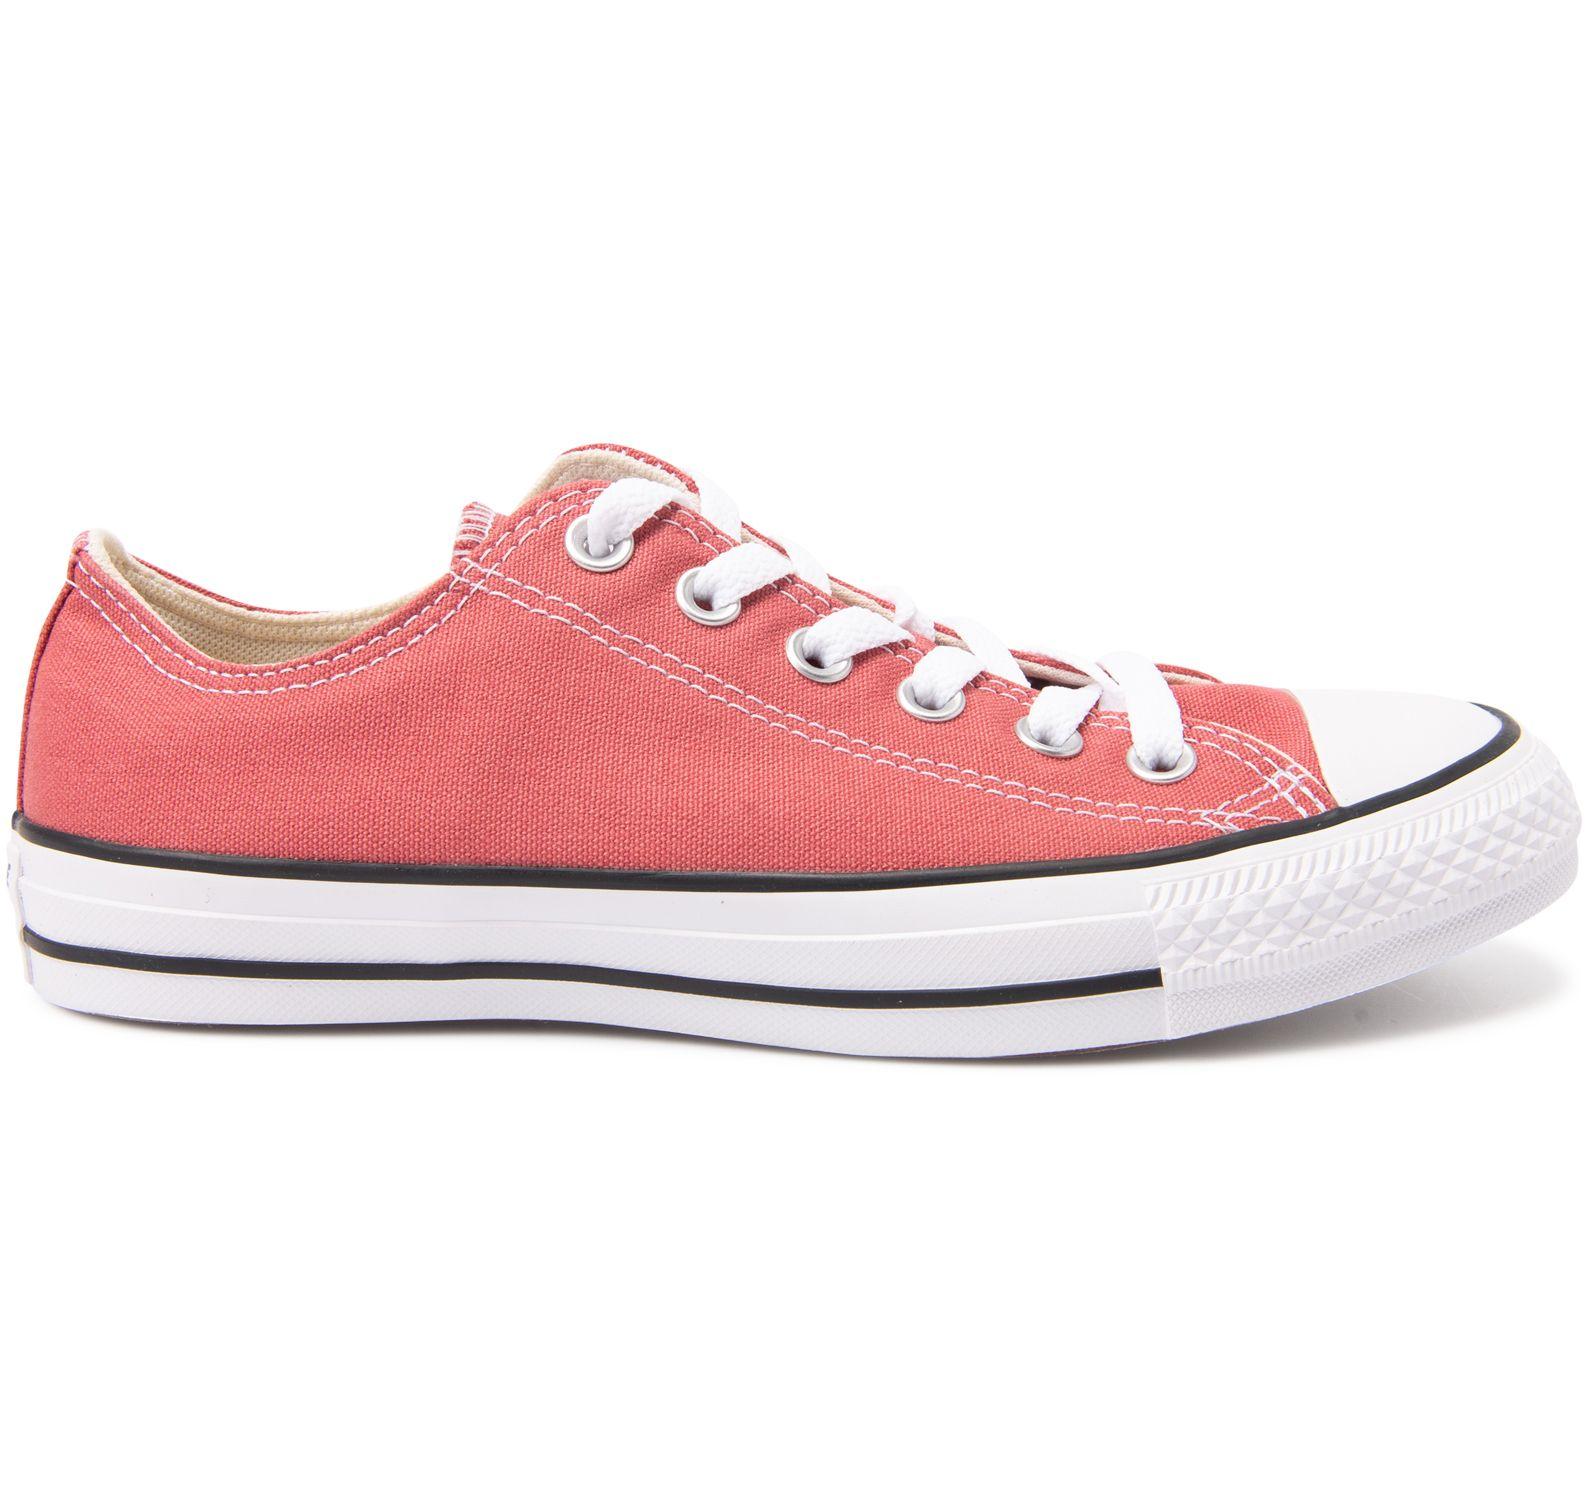 Köp Converse Chuck Taylor All Star Ox Canvas Maroon rosa